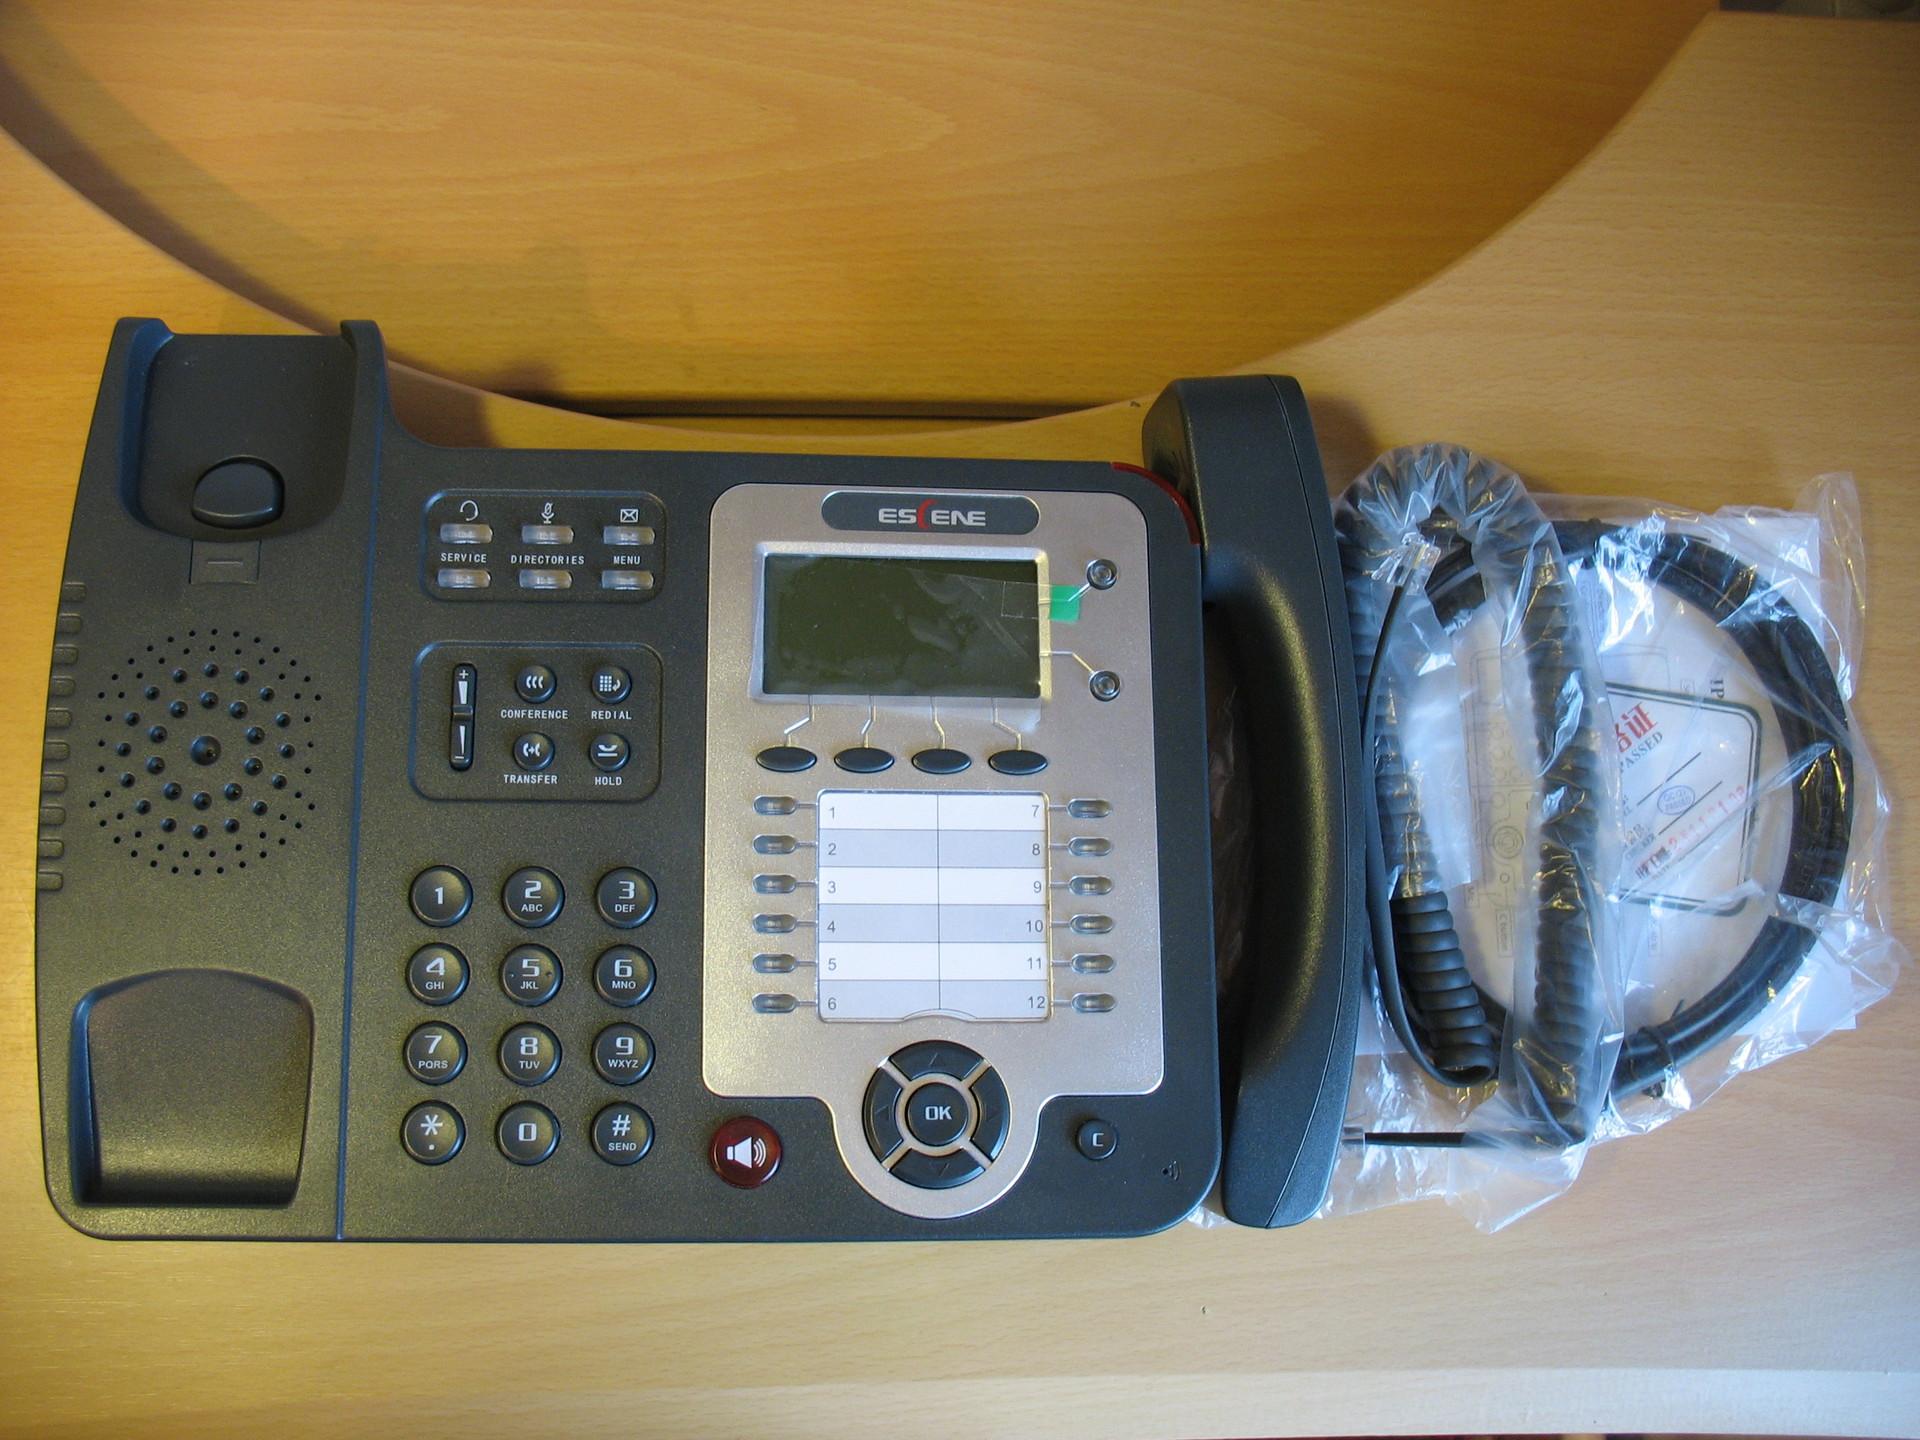 Комплект поставки телефона